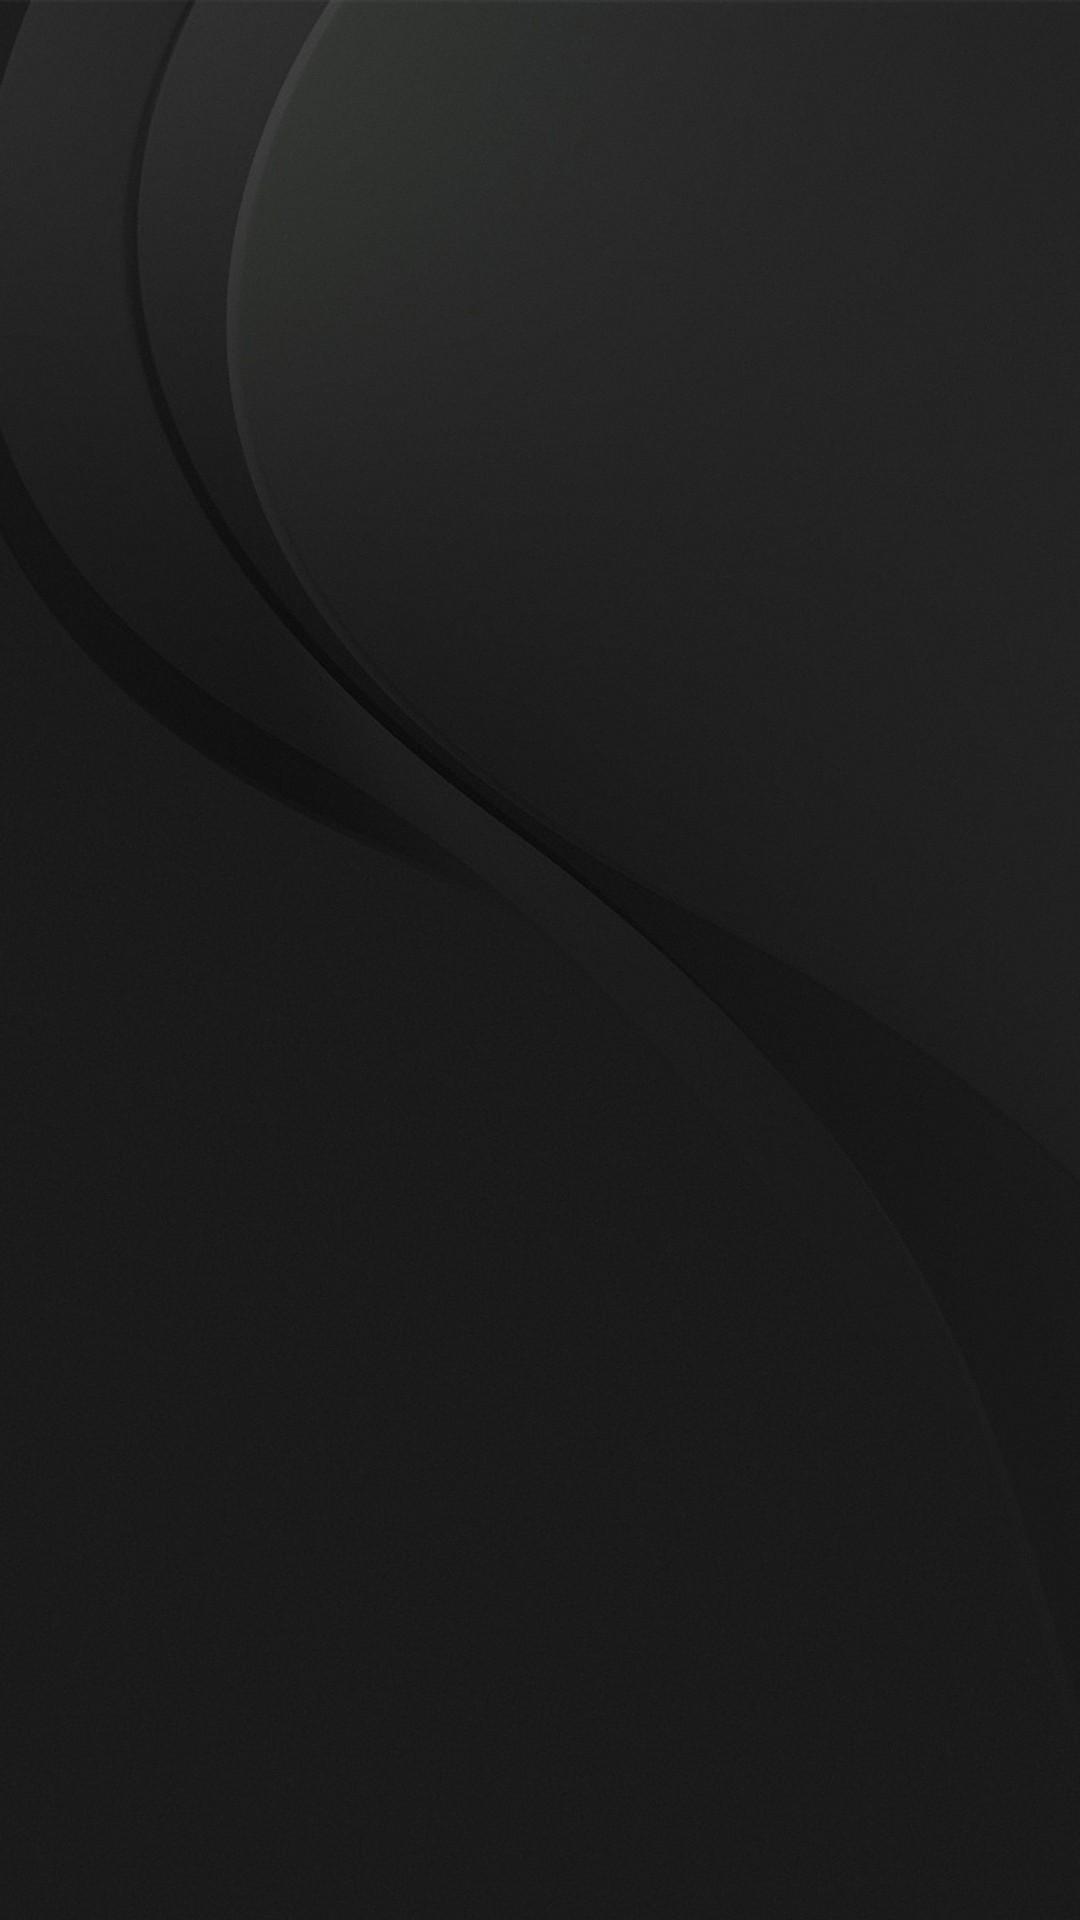 Samsung Mobile Black Hd Wallpapers Wallpaper Cave